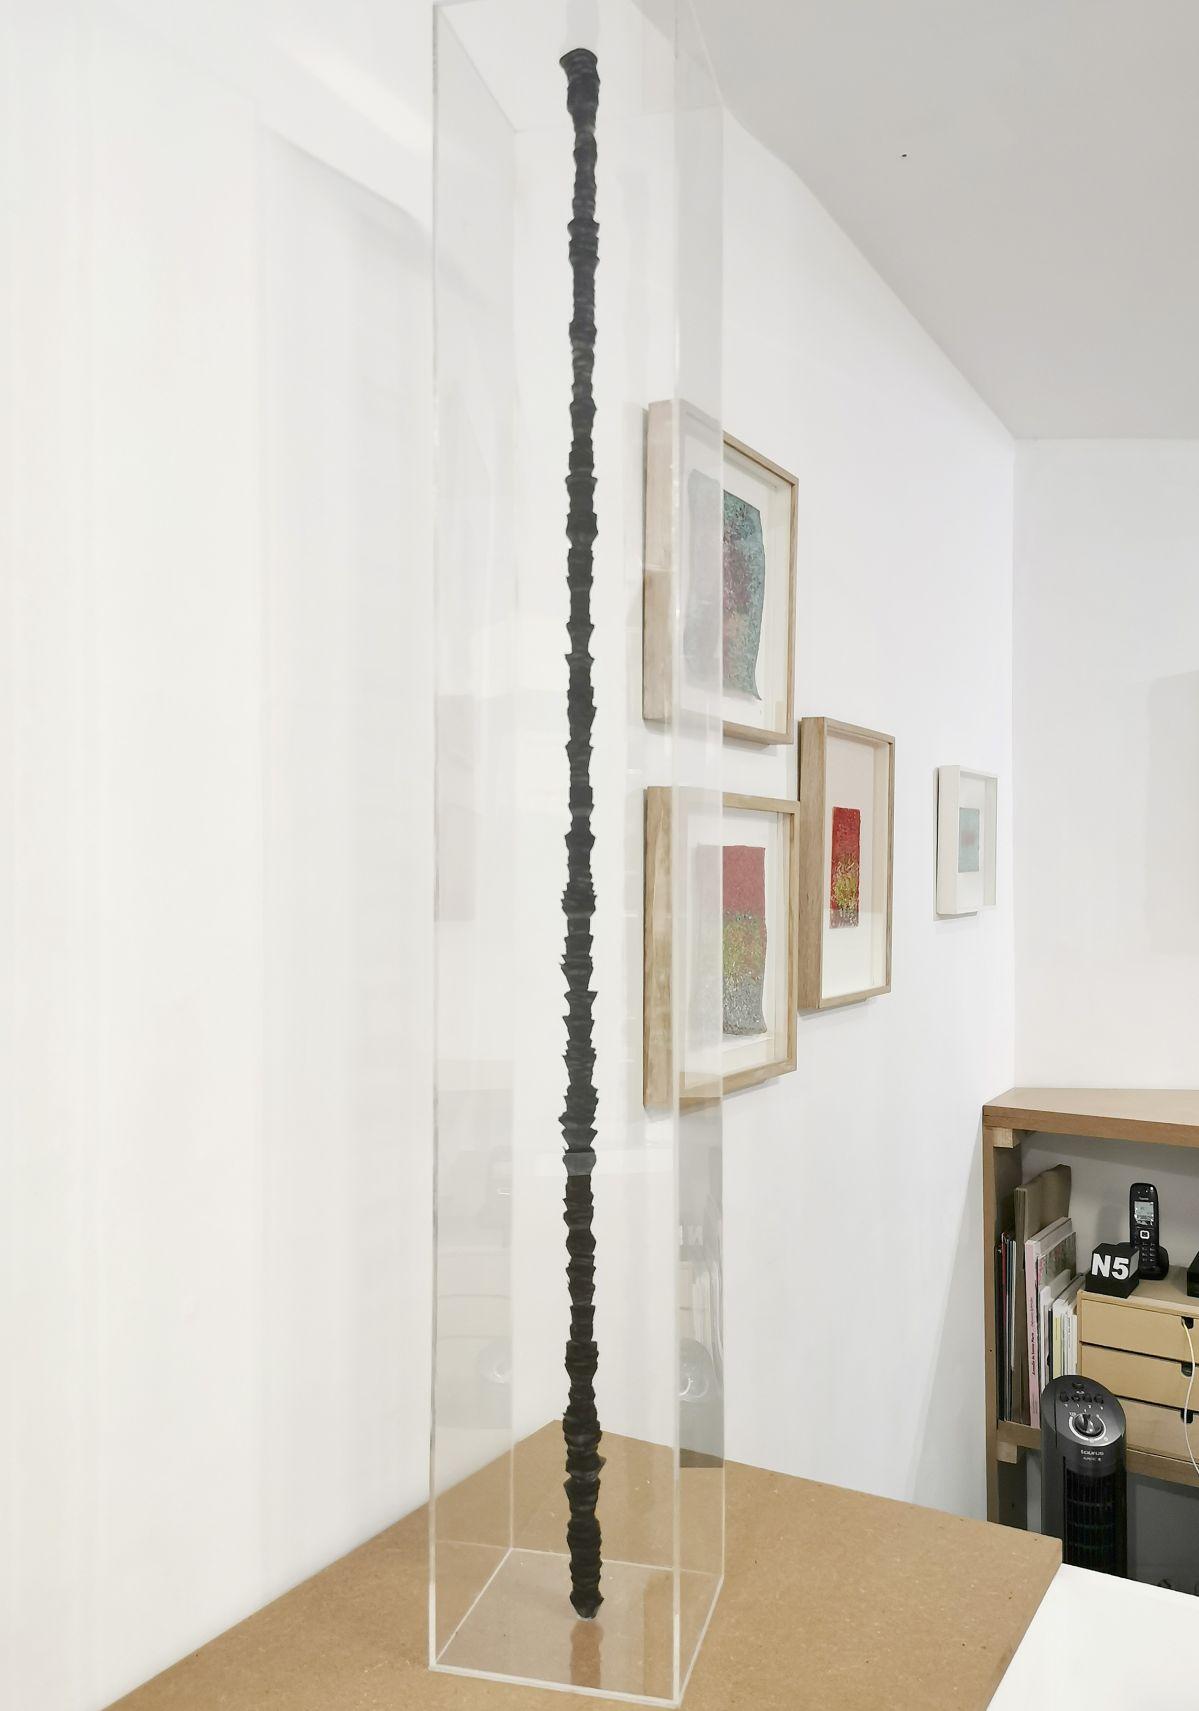 Helga Stüber-Nicolas – Ralentir Travaux à la N5 Galerie – Montpellier